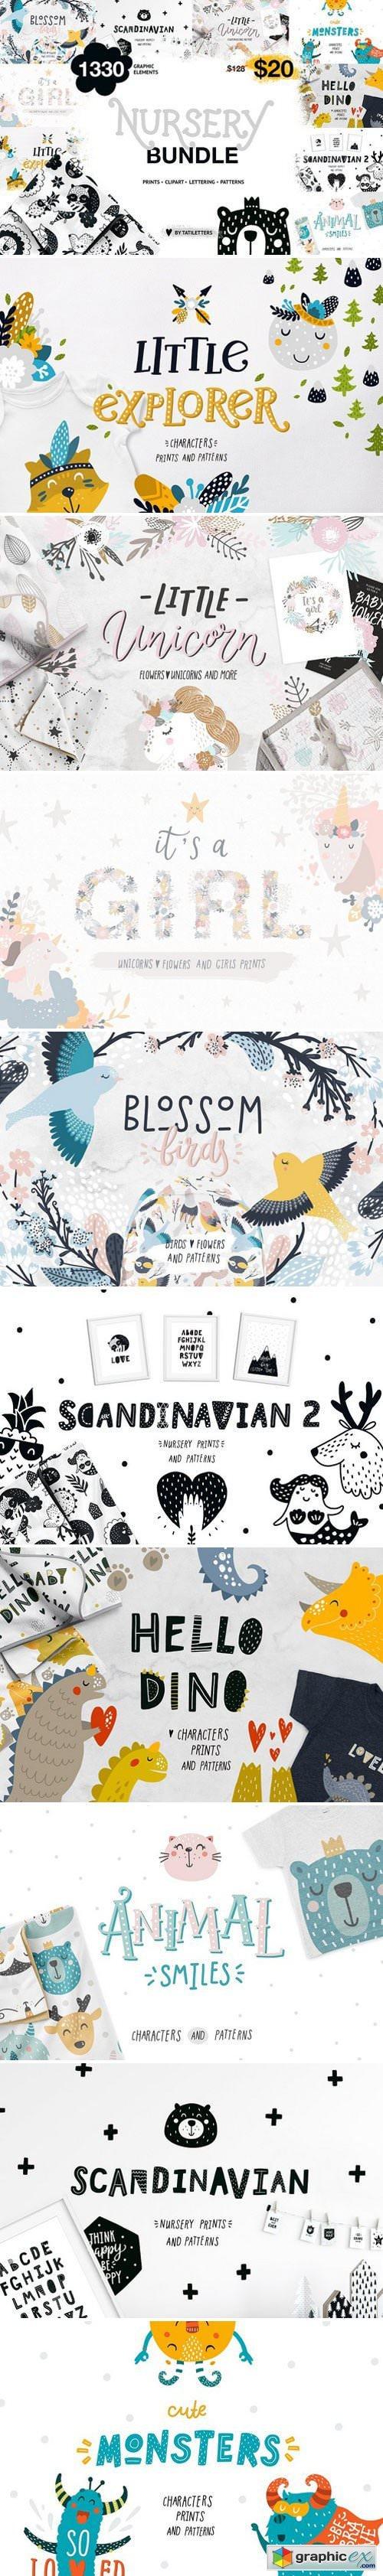 Nursery bundle - Prints patterns